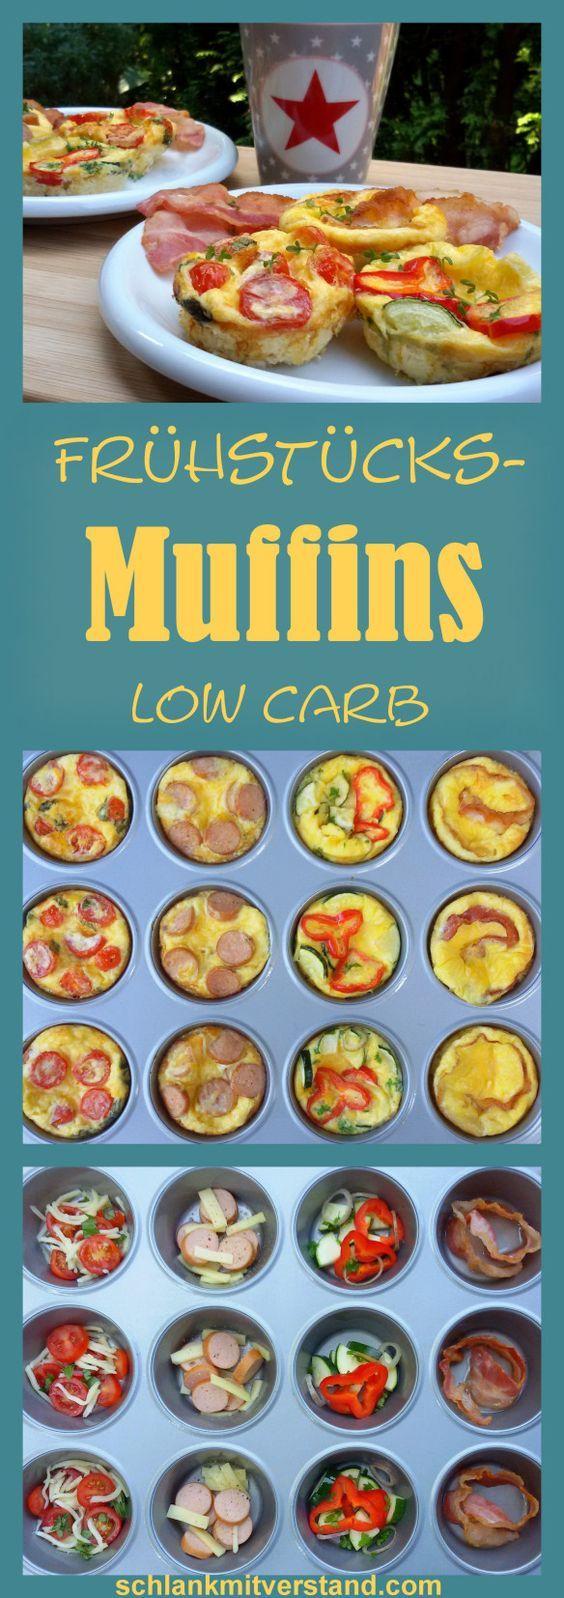 Frühstücks-Muffins mit Ei low carb